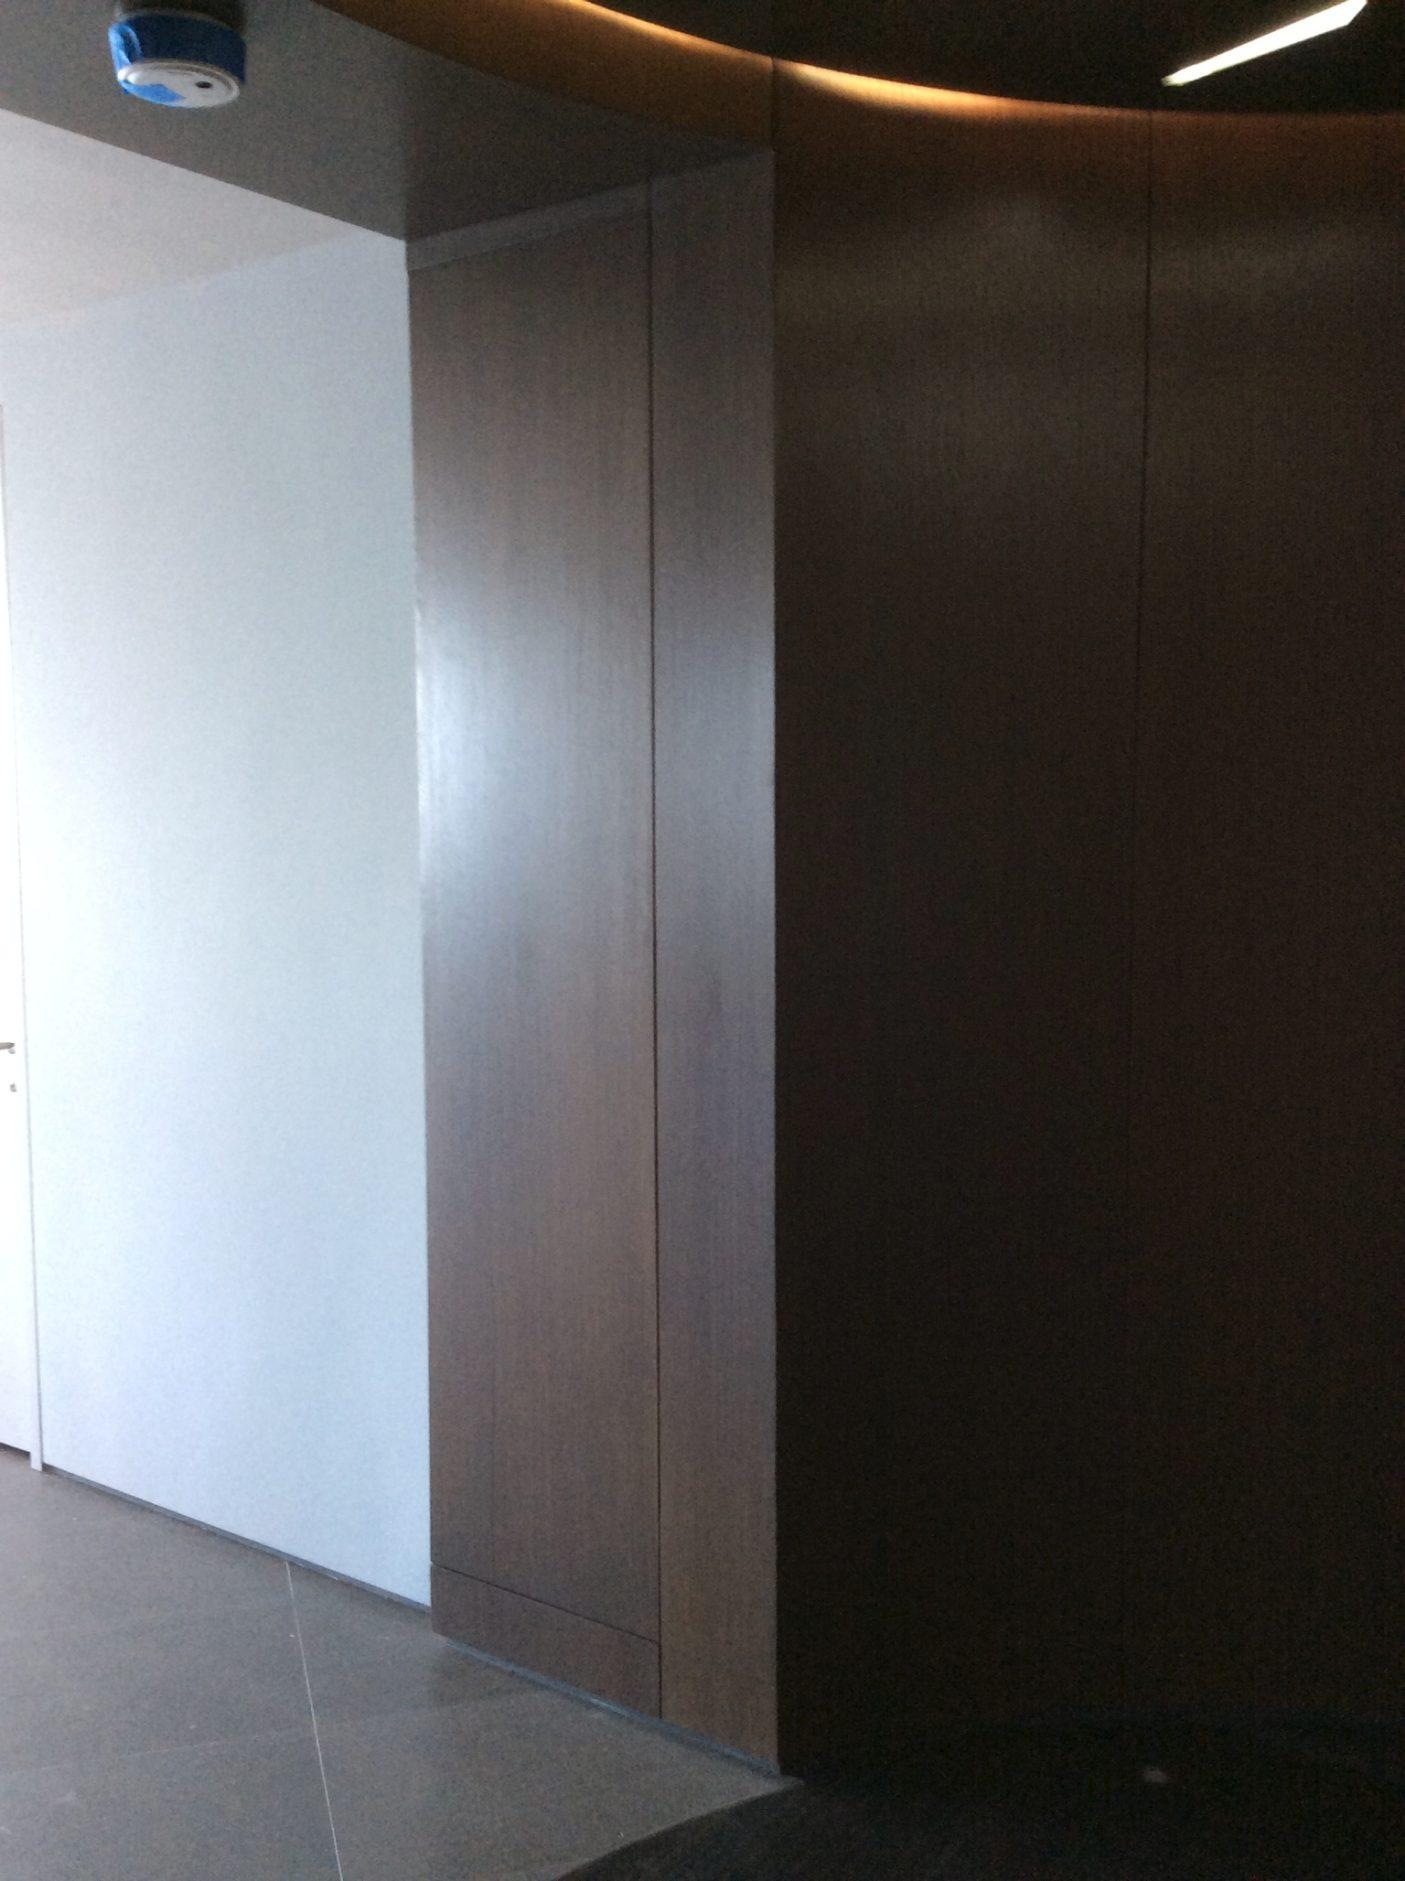 Panels-And-Doors-21.jpg